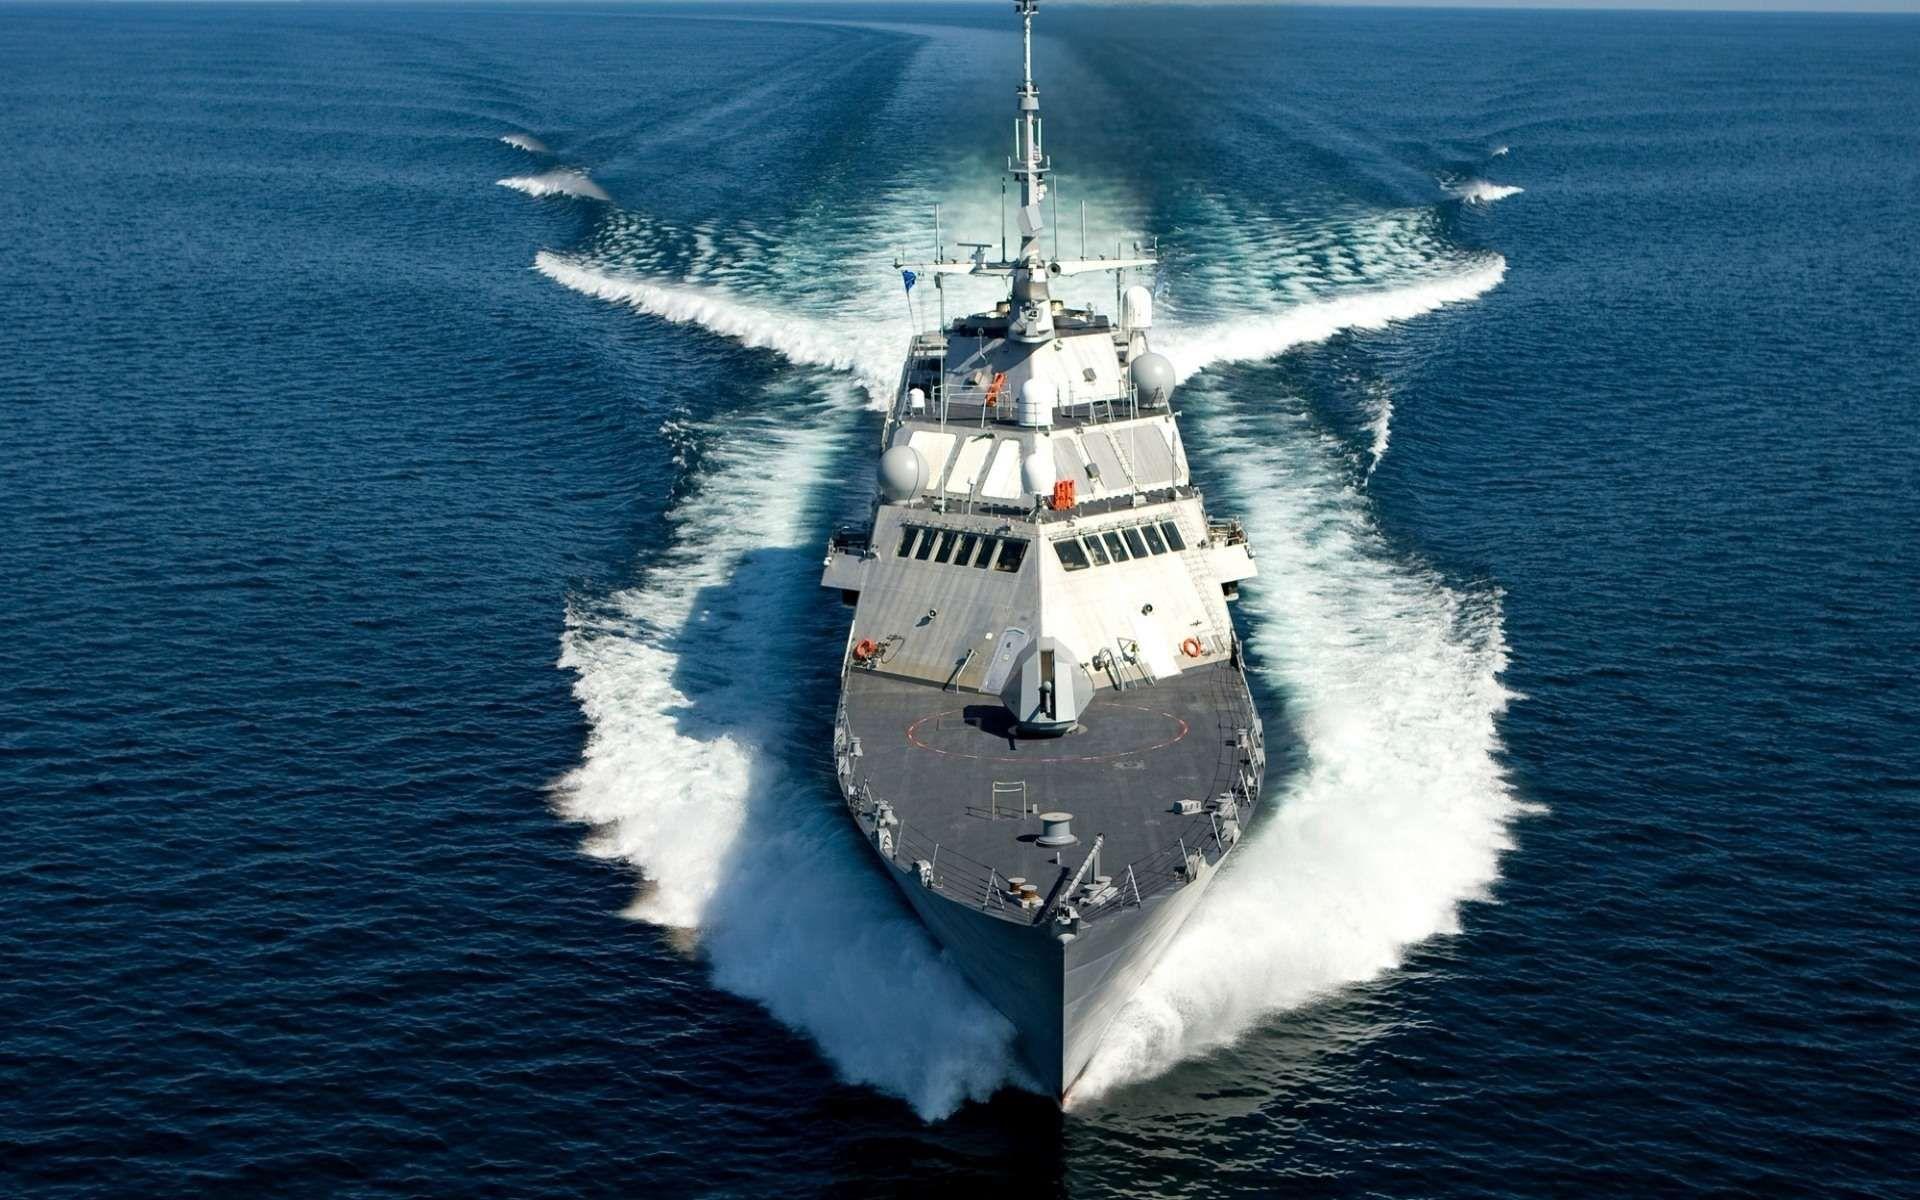 Wallpaper Indian Navy Pic